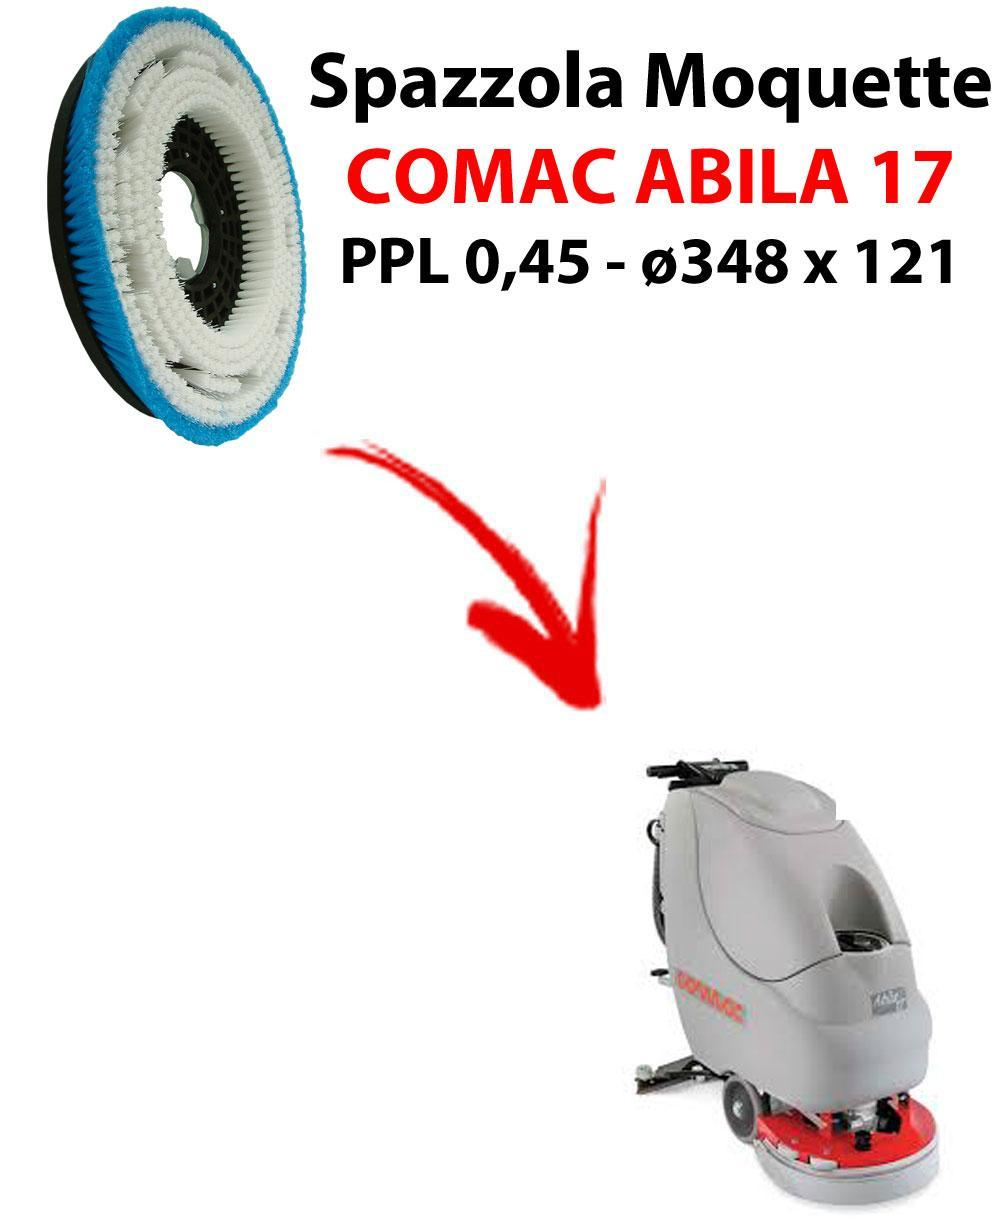 MOQUETTE BRUSH for scrubber dryer COMAC ABILA 17. Model: PPL 0,45 C/FLANGIA ⌀348 X 121